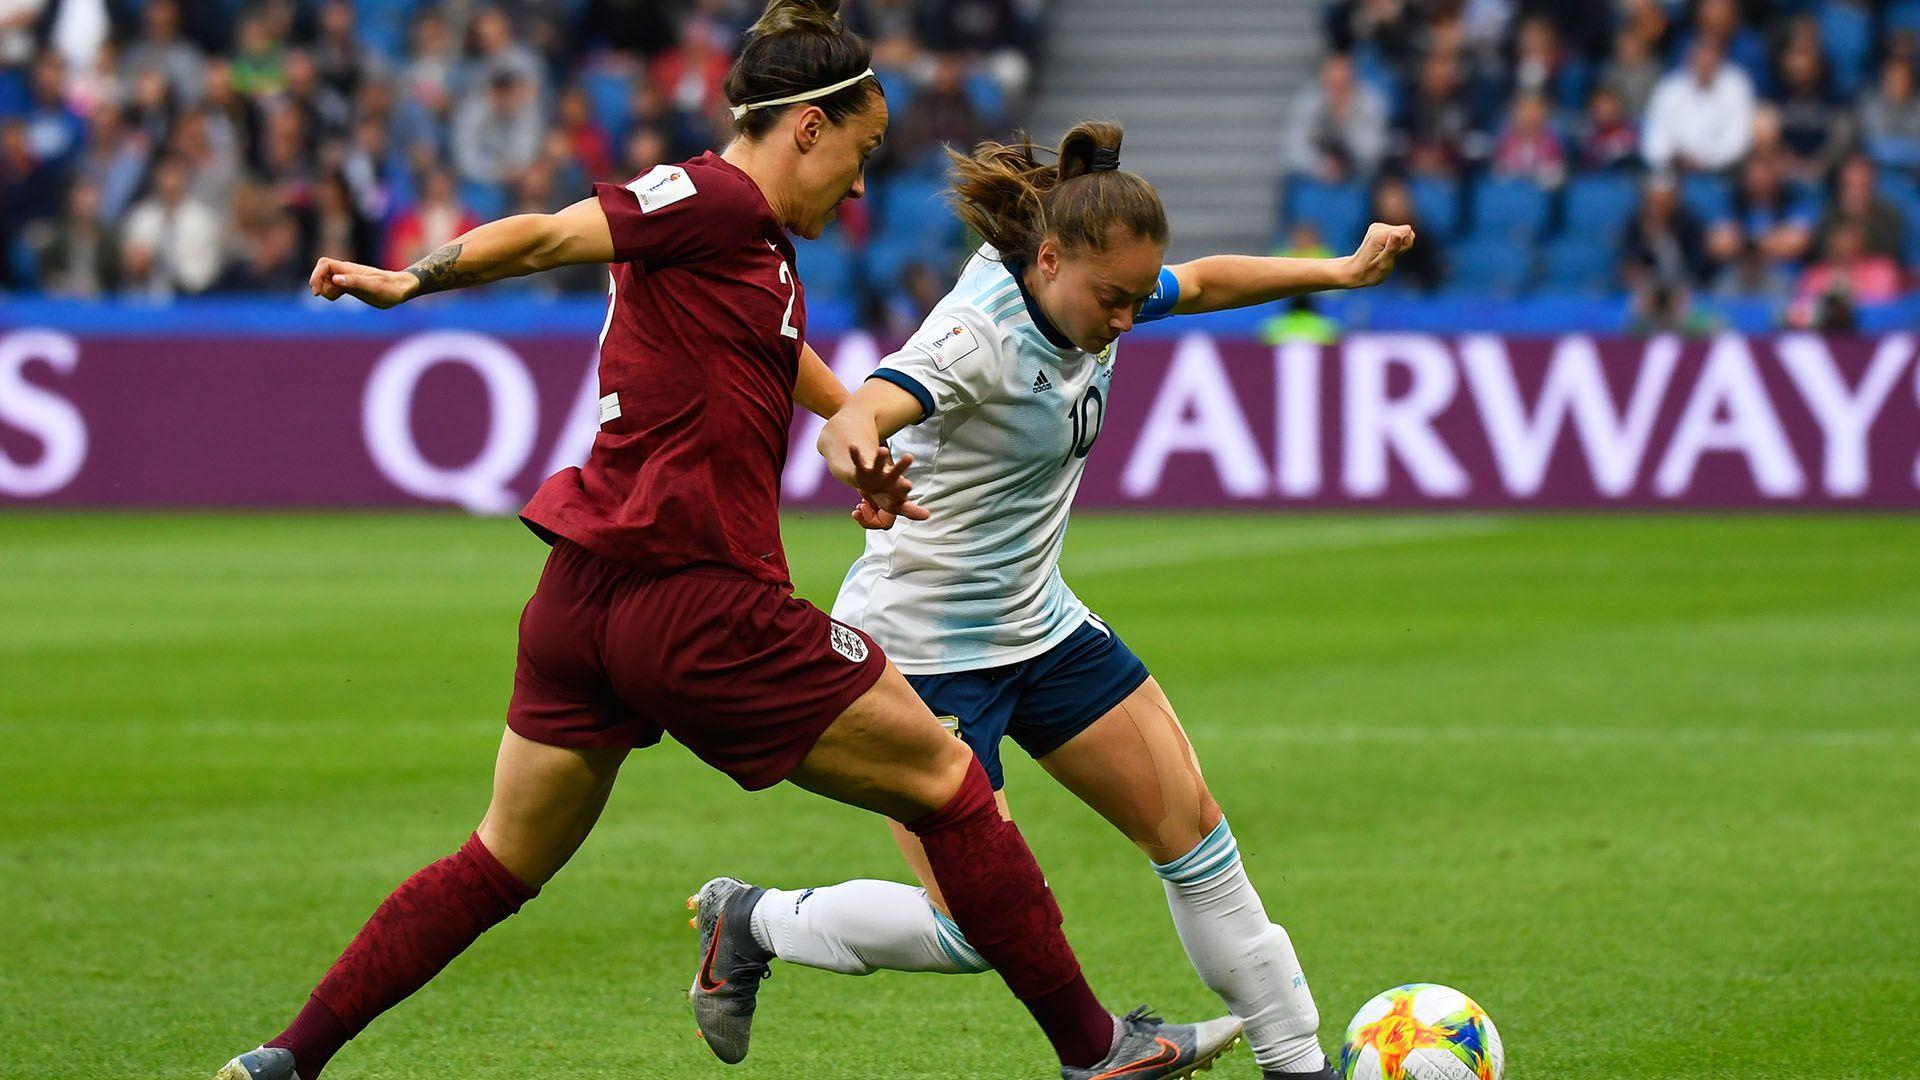 Banini, la capitana de la selección argentina. en acción frente a Inglaterra (Damien MEYER / AFP)